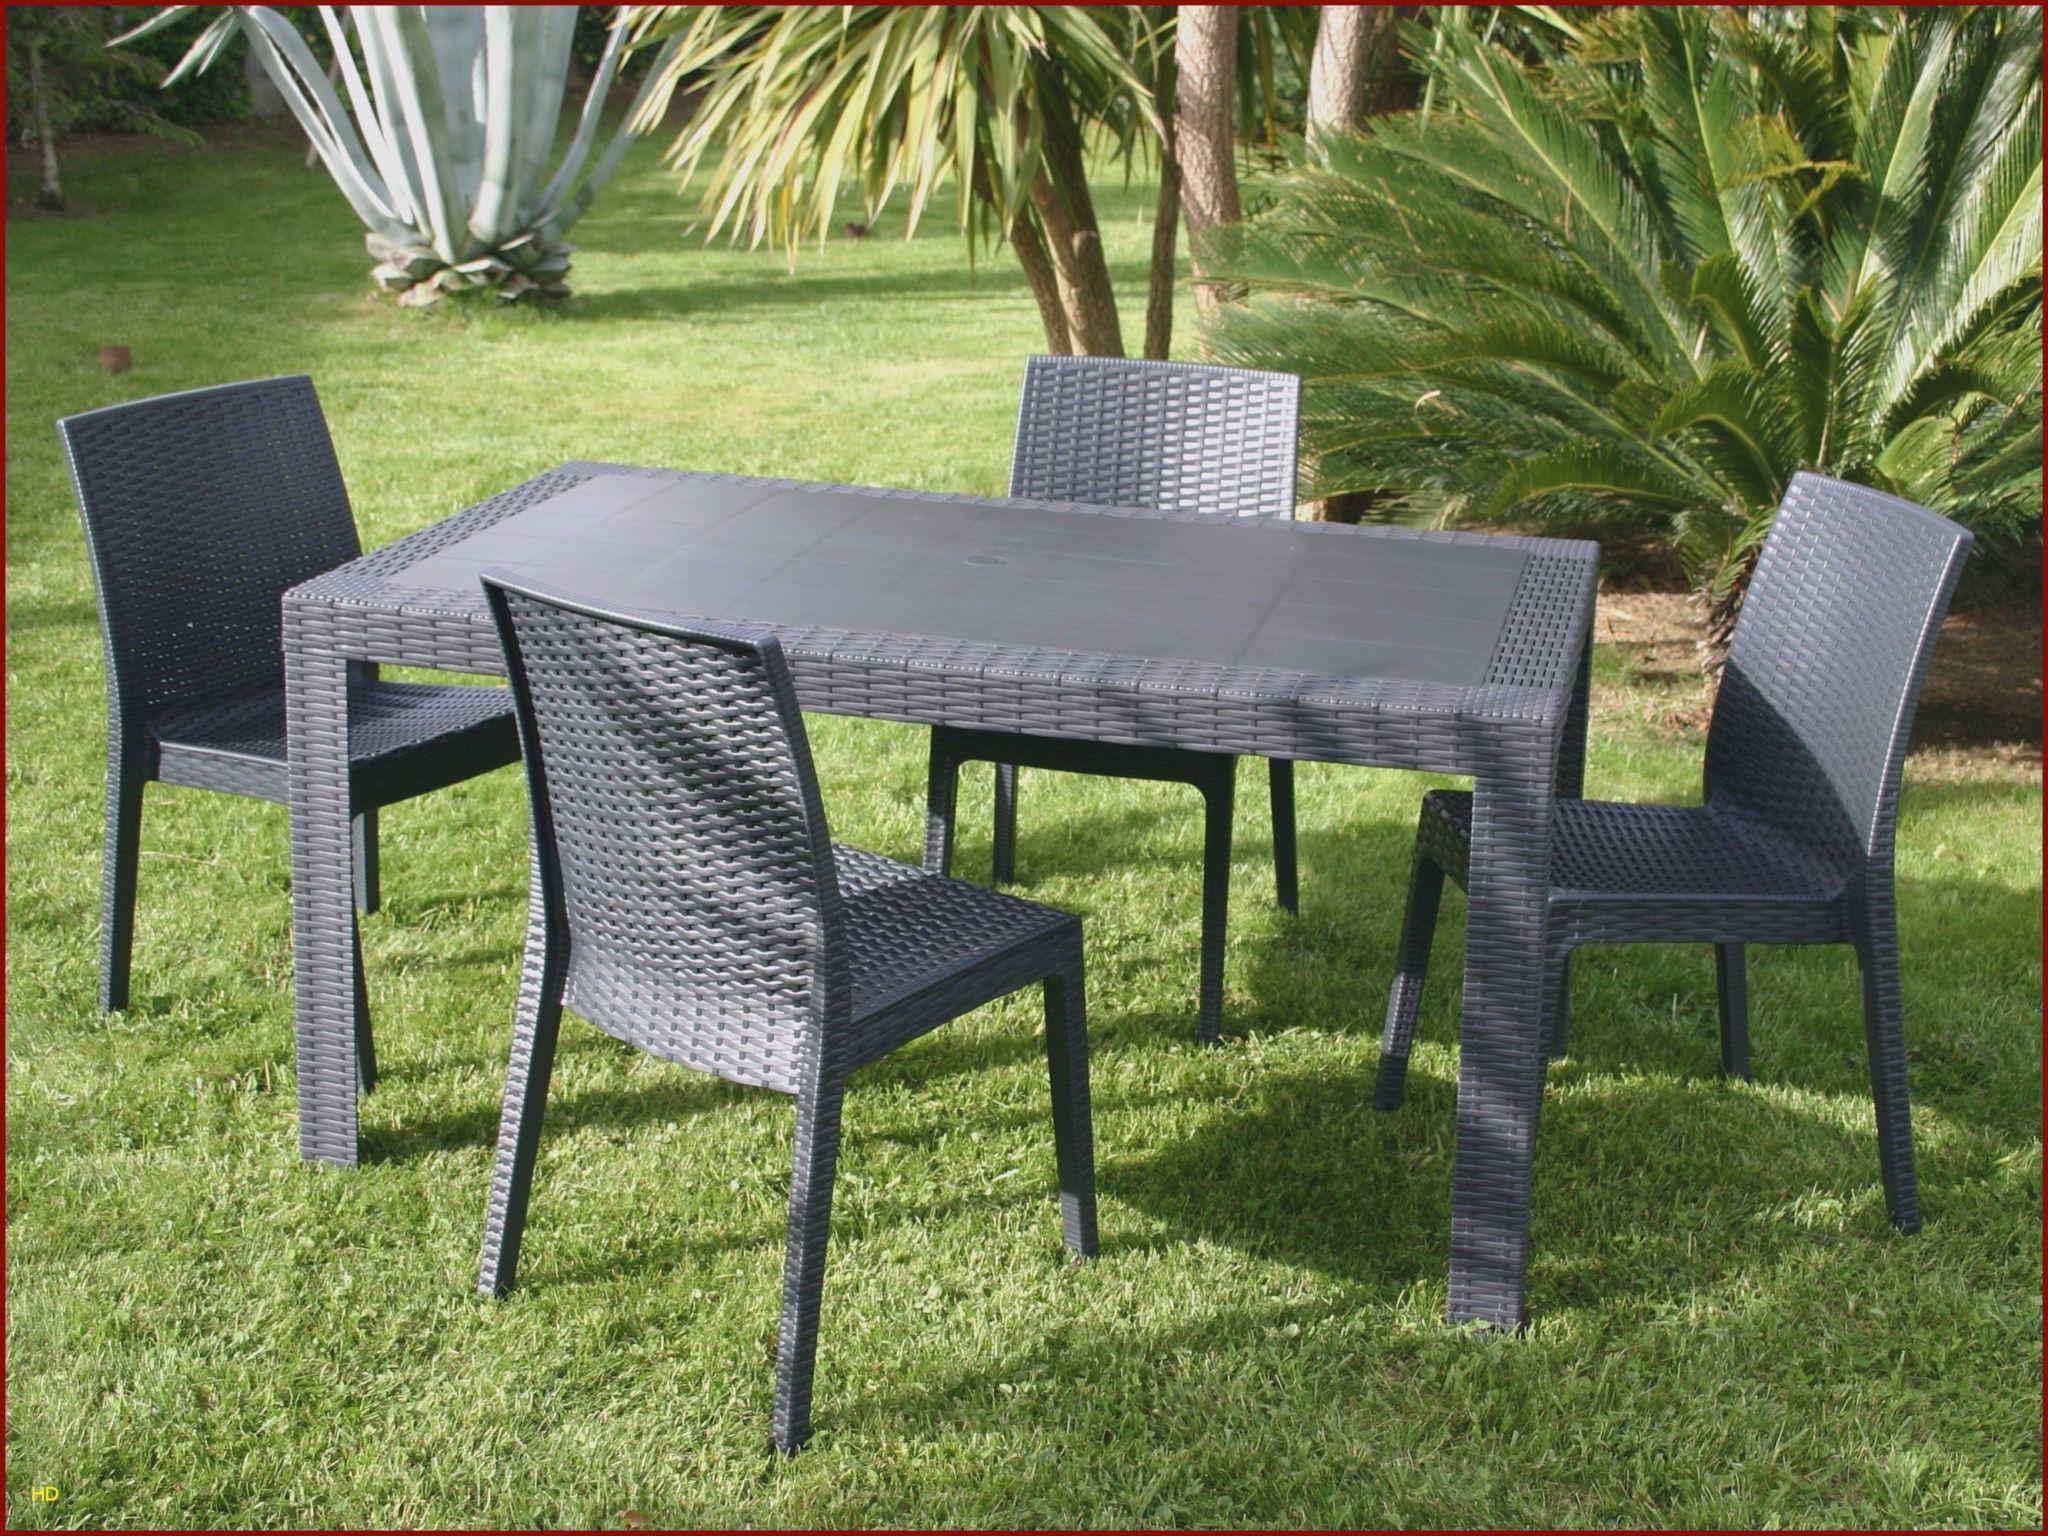 Salon De Jardin En Acacia Frais Chaises Luxe Chaise Ice 0d Table Jardin Resine Lovely